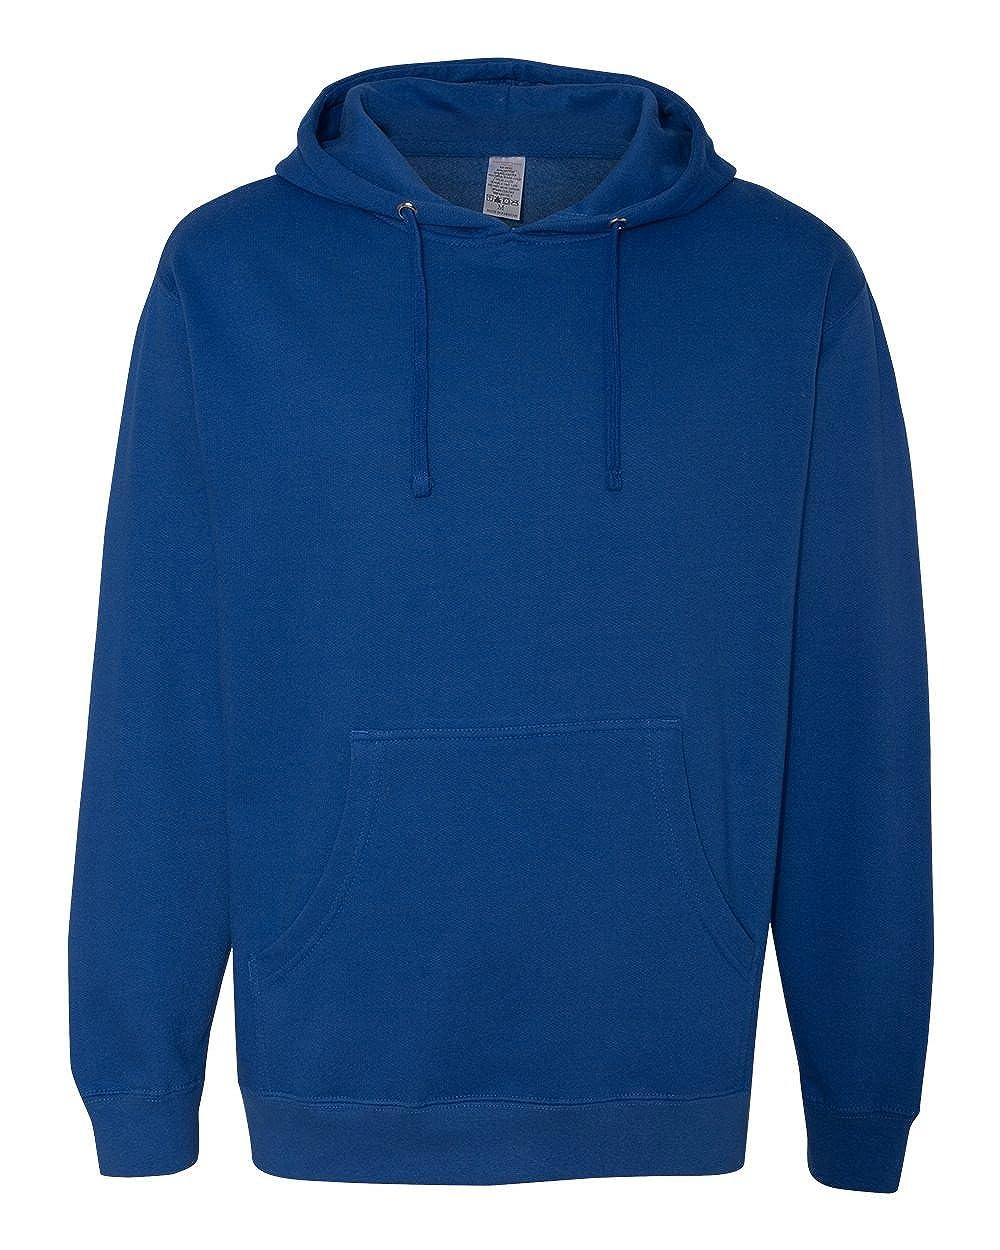 L ITC Mens Midweight Hooded Sweatshirt -ROYAL SS4500